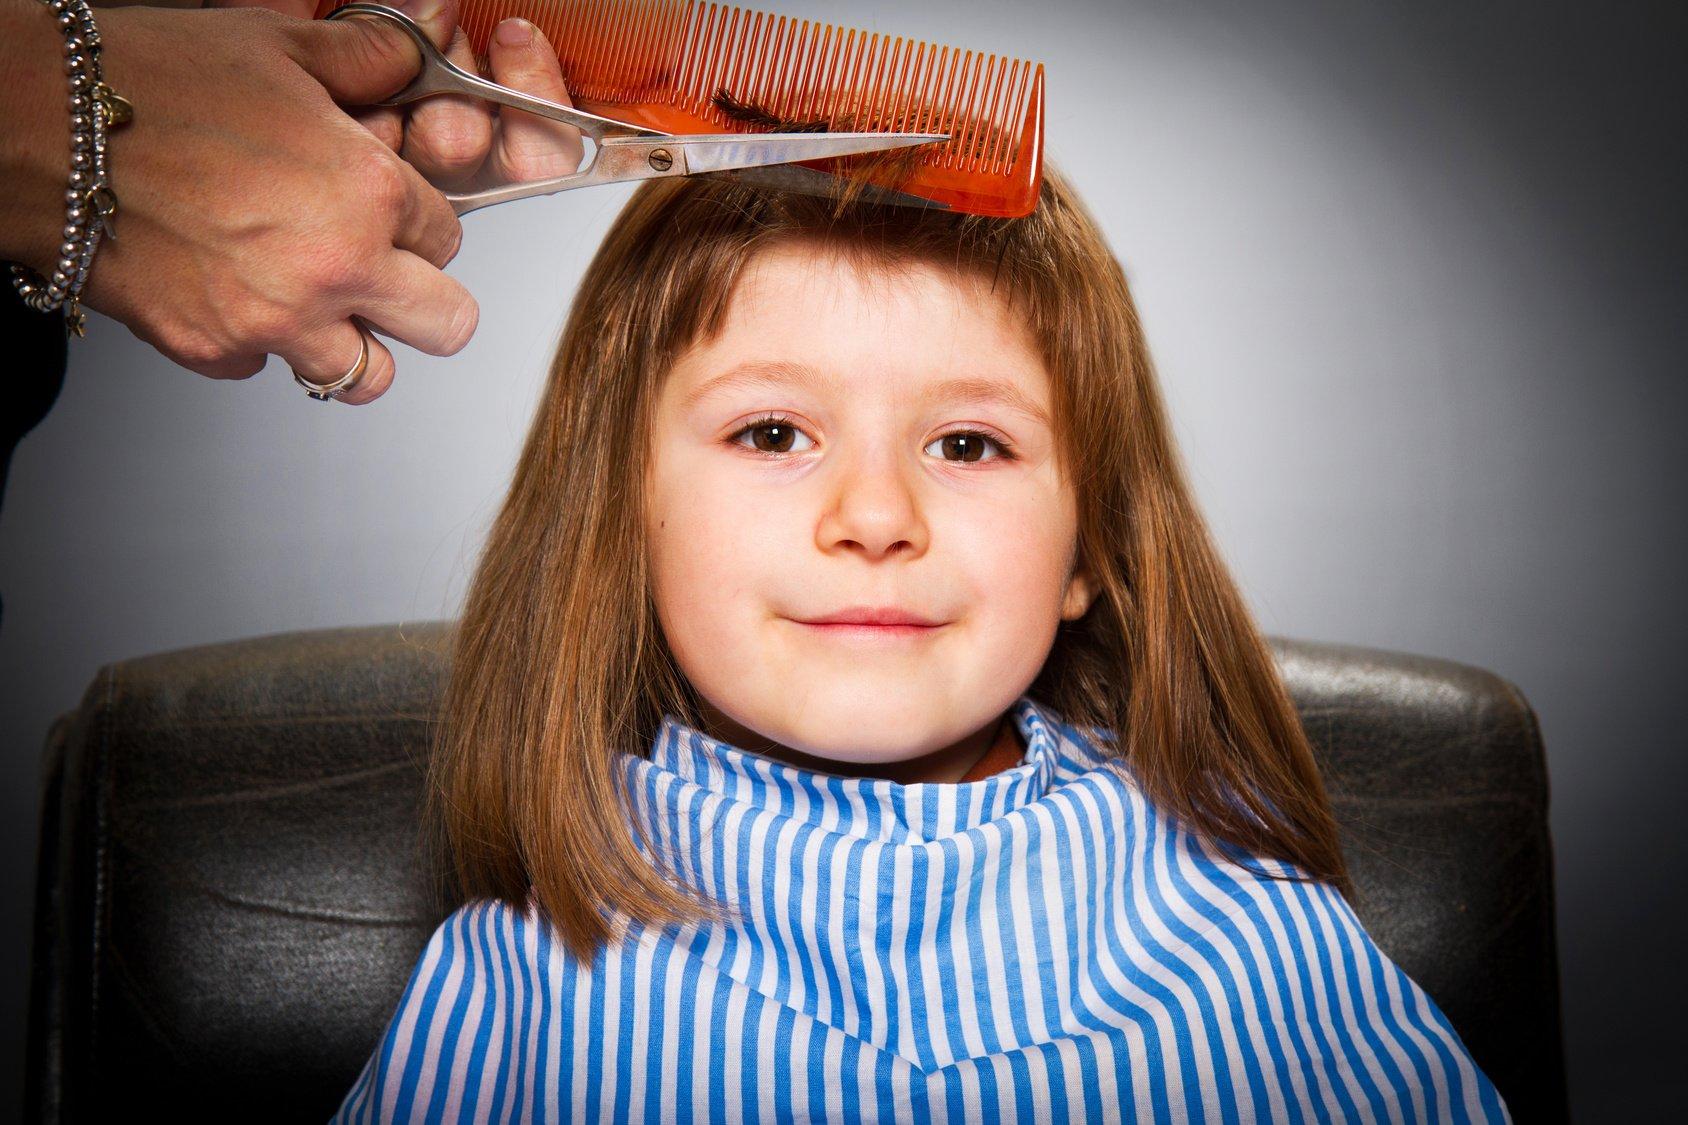 Image result for 子どもの髪の毛を切る